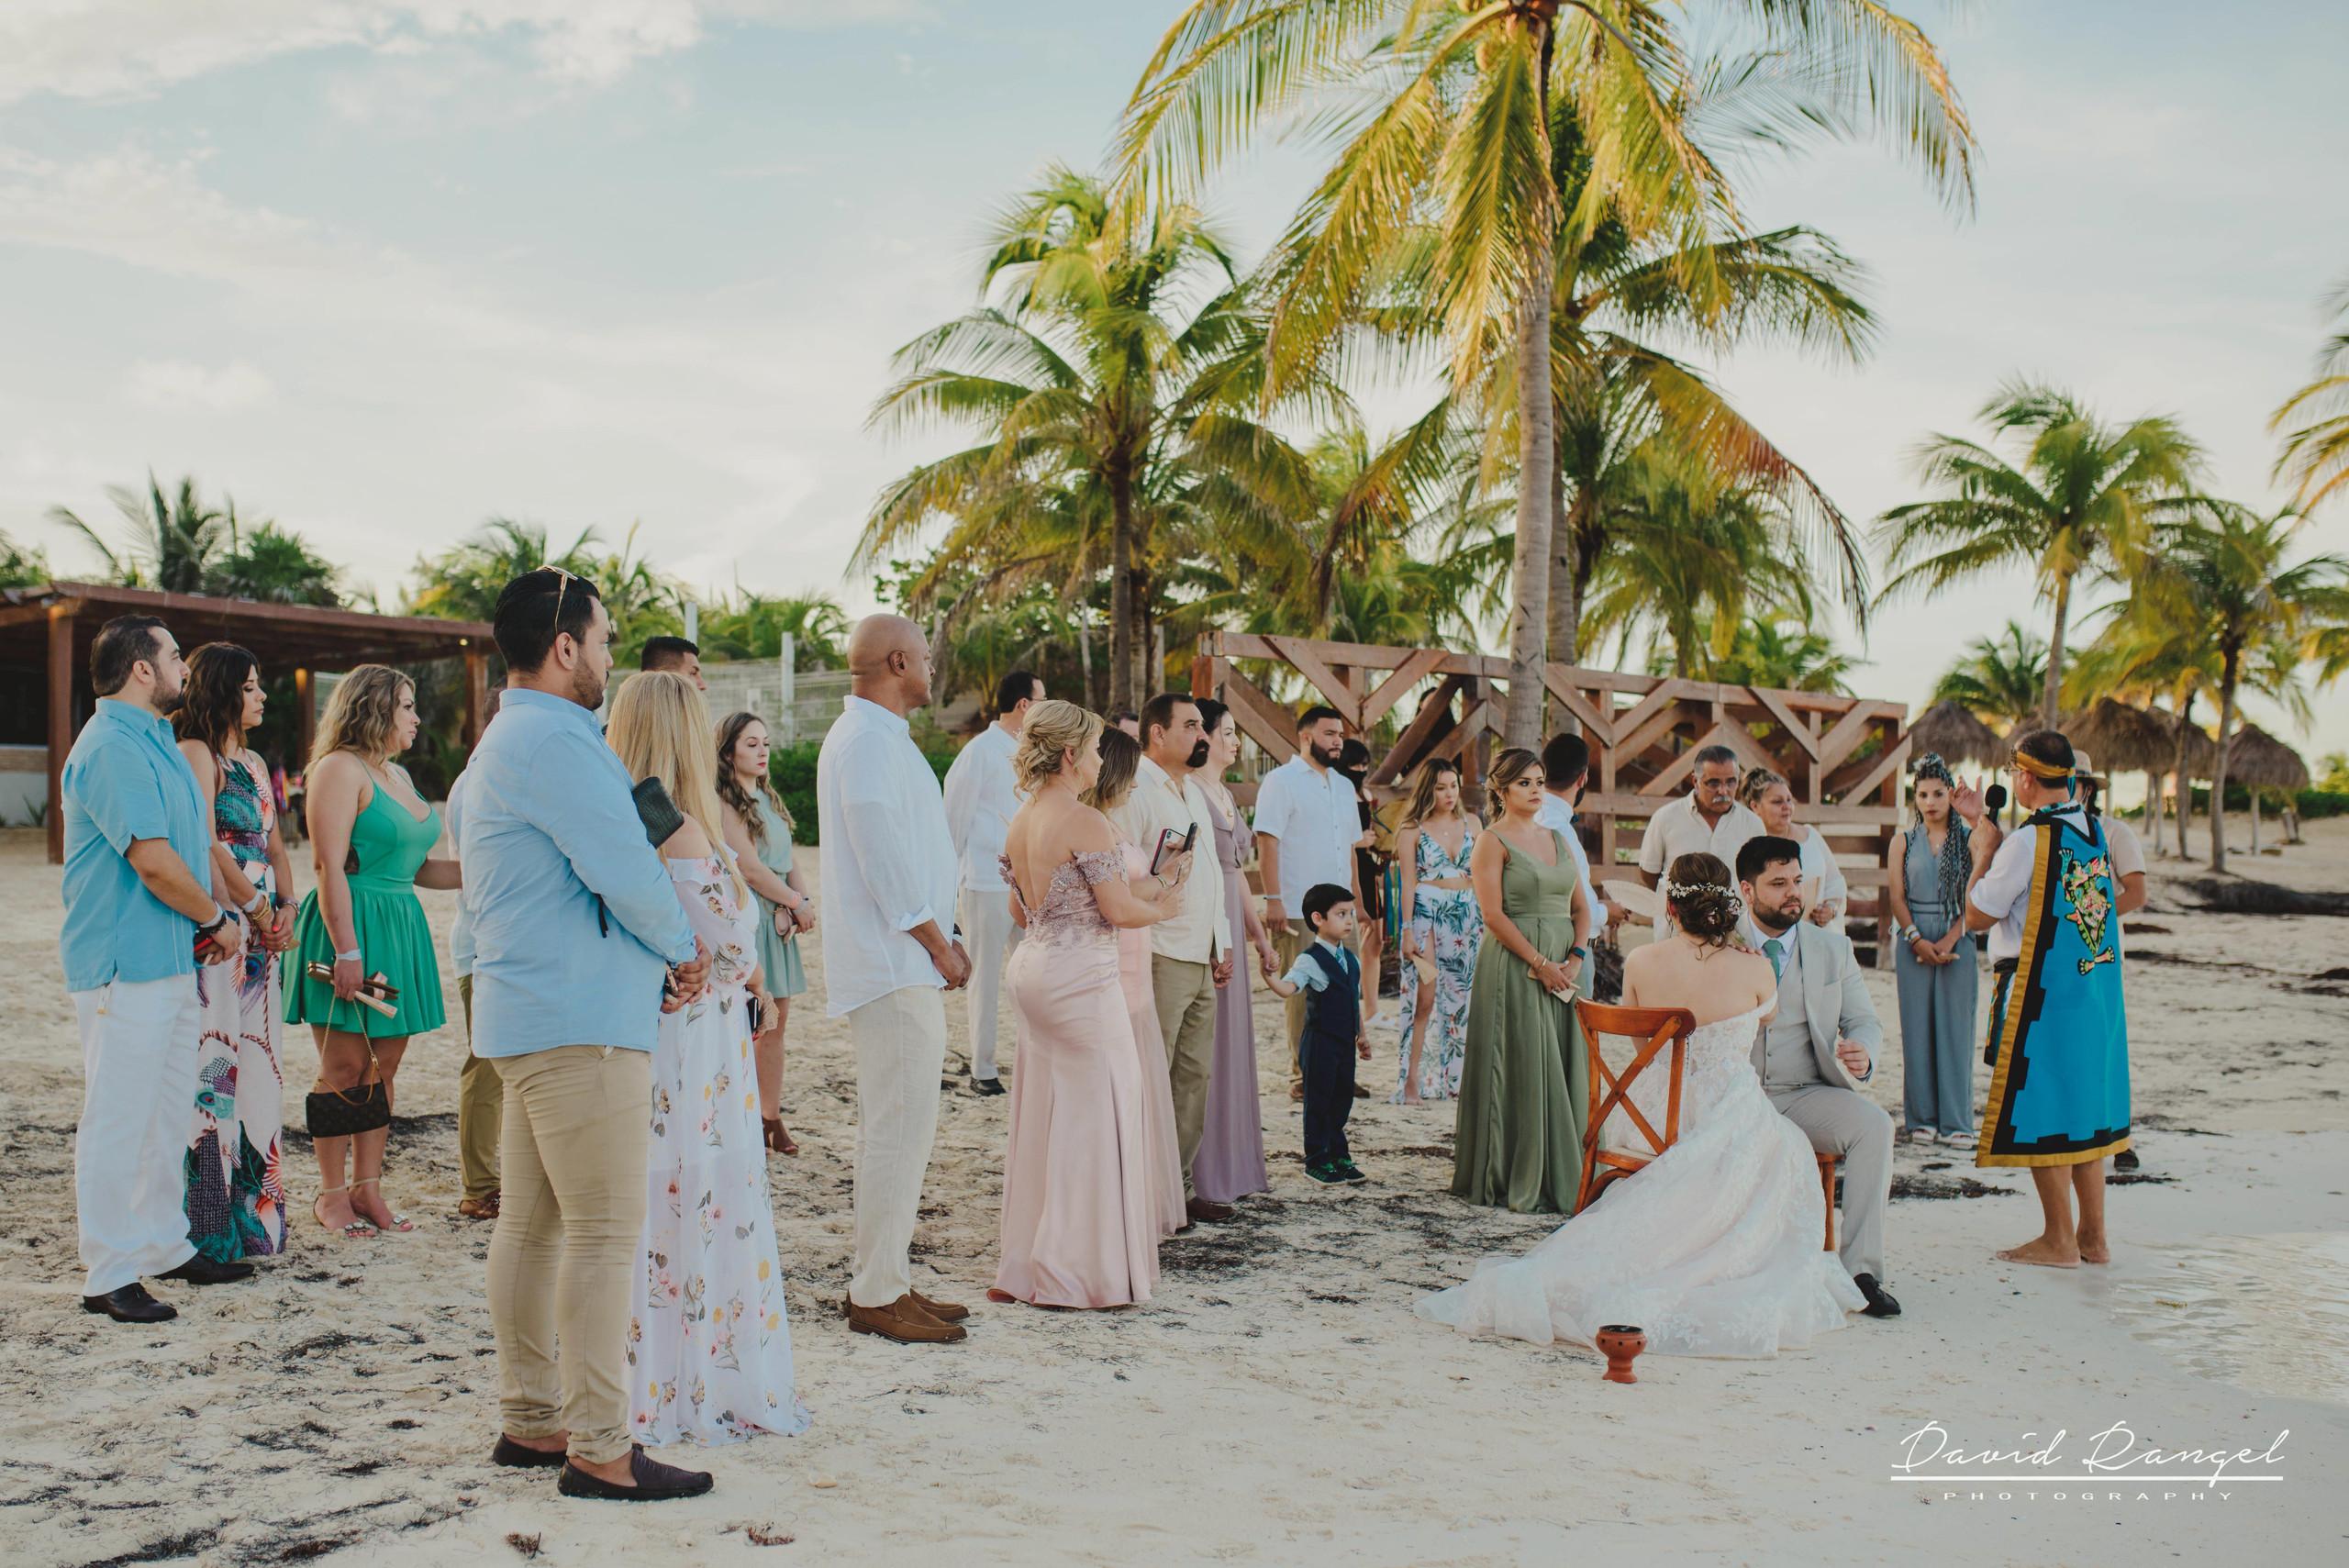 groom+bride+wedding+ceremony+dress+villa+chenera+isla+blanca+costa+mujeres+garden+beach+chaman+traditional+mayan+wedding+guest+friends+family